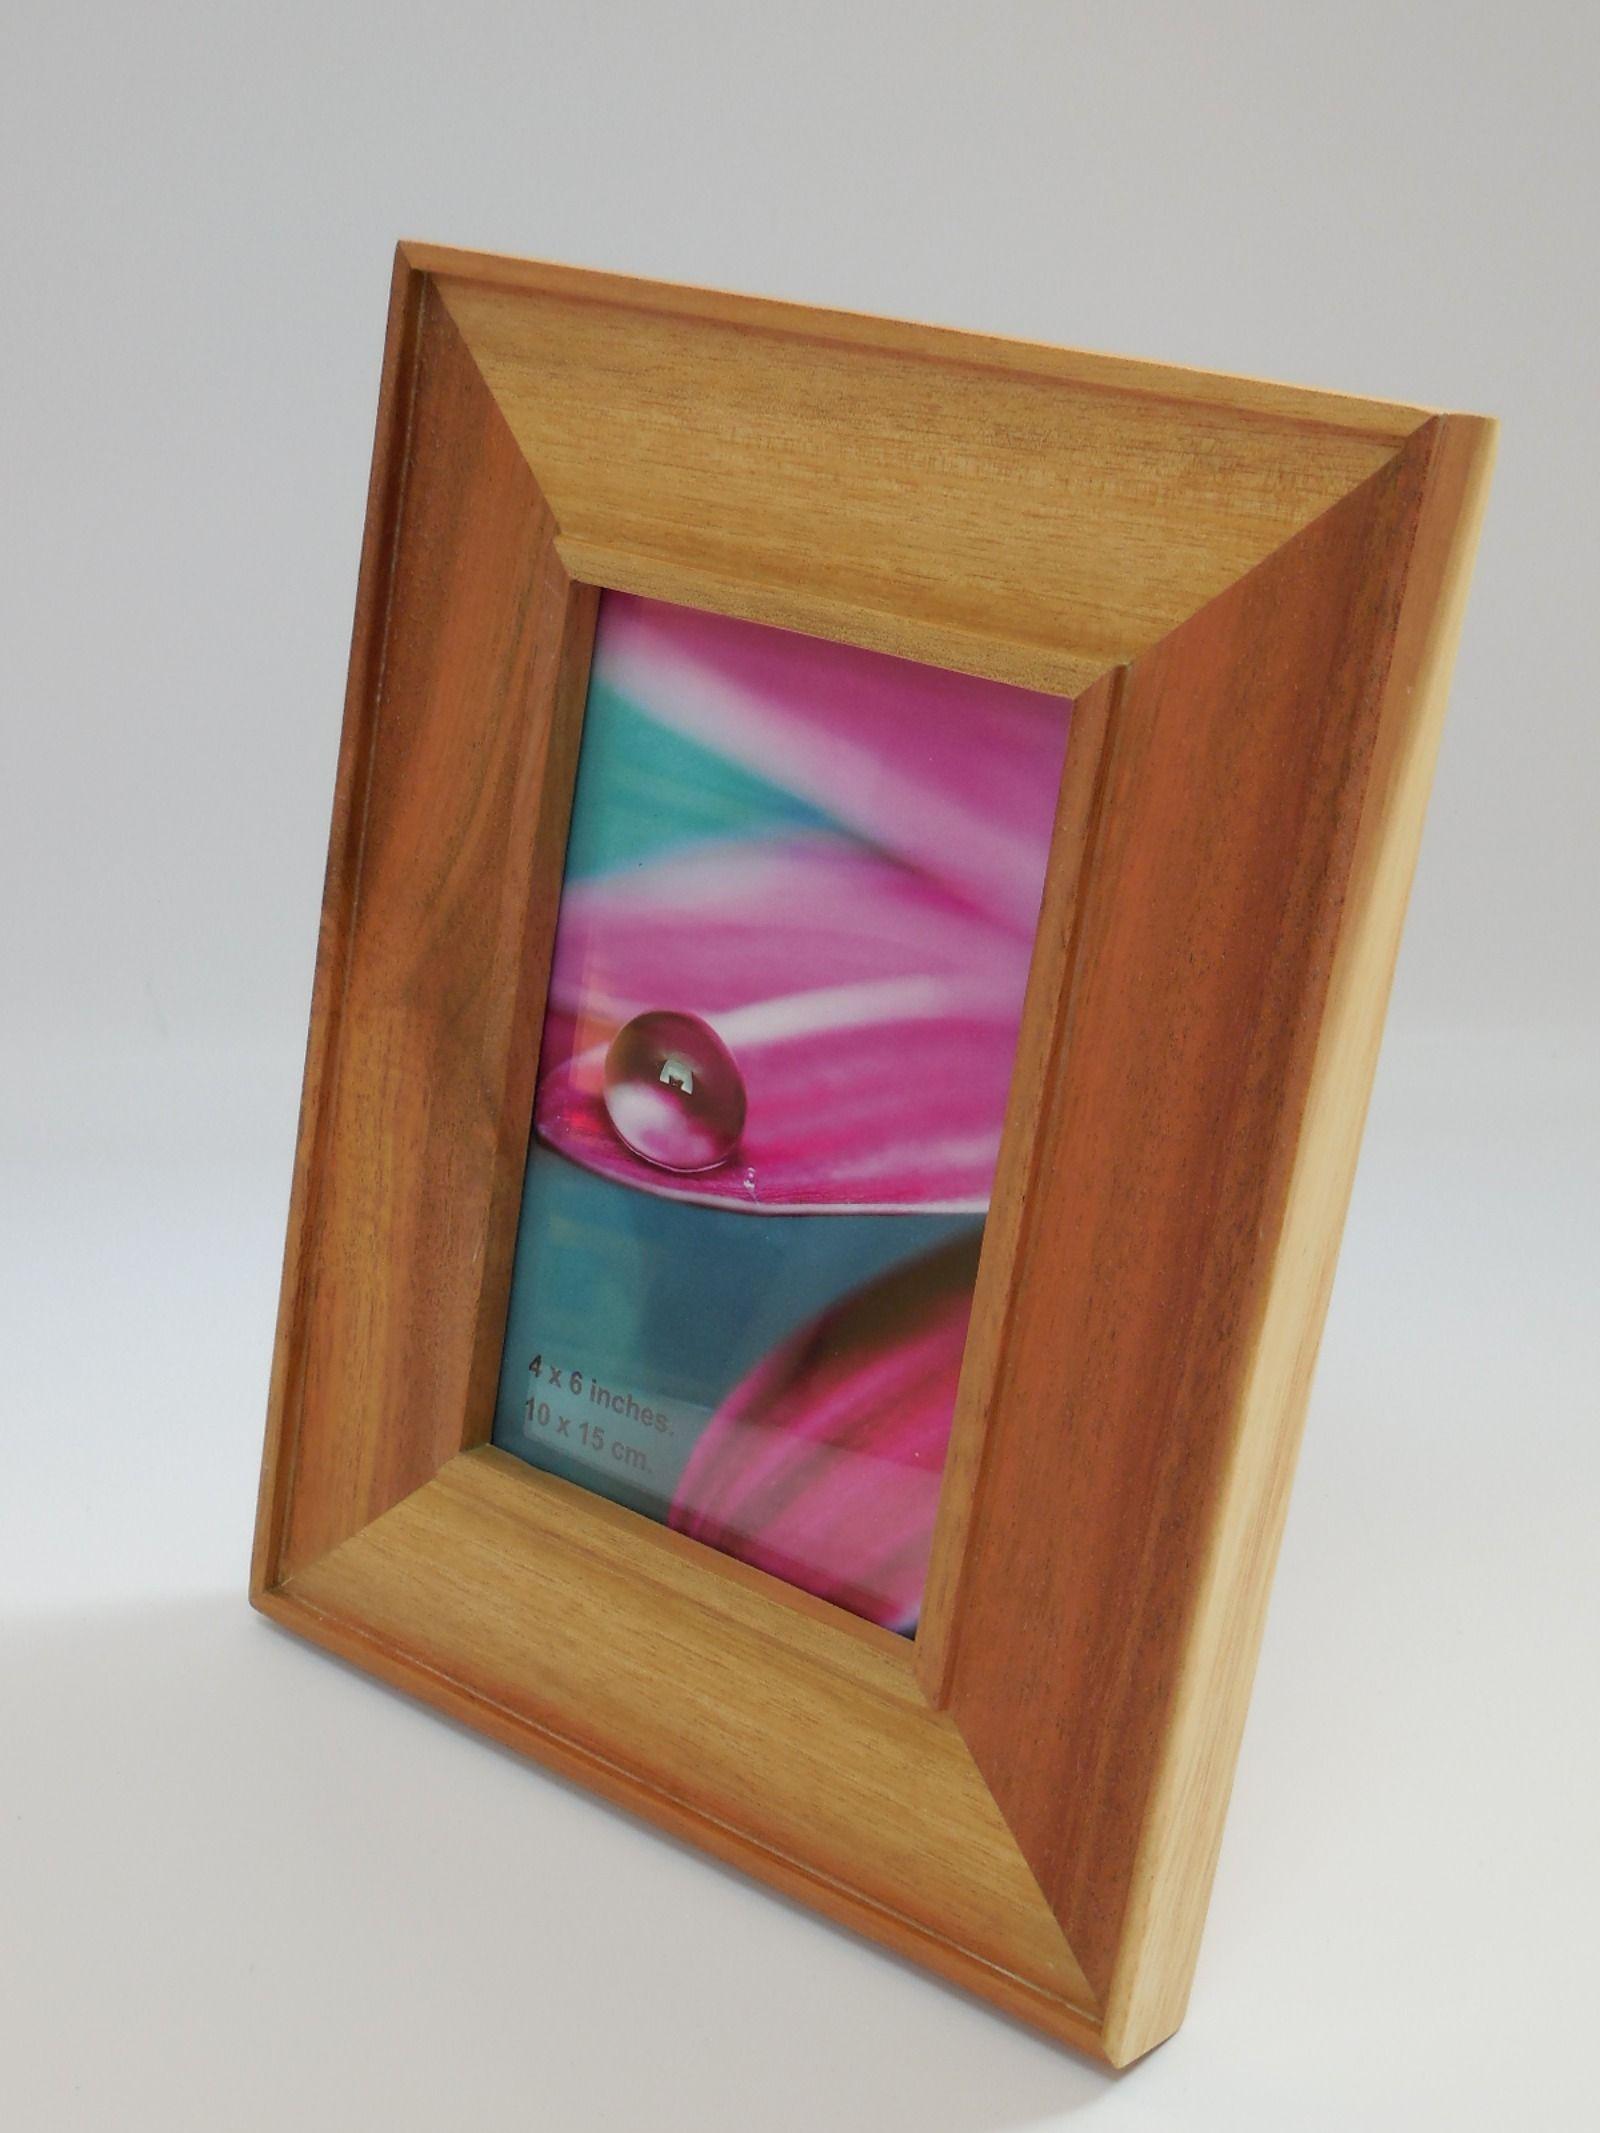 Wood Picture Frame Wooden Photo Frame Natural Wood Frame Square Picture Frame Solid Wood Frame Custom Frame Tabletop Frame Hardwood By Frasastyle On Etsy